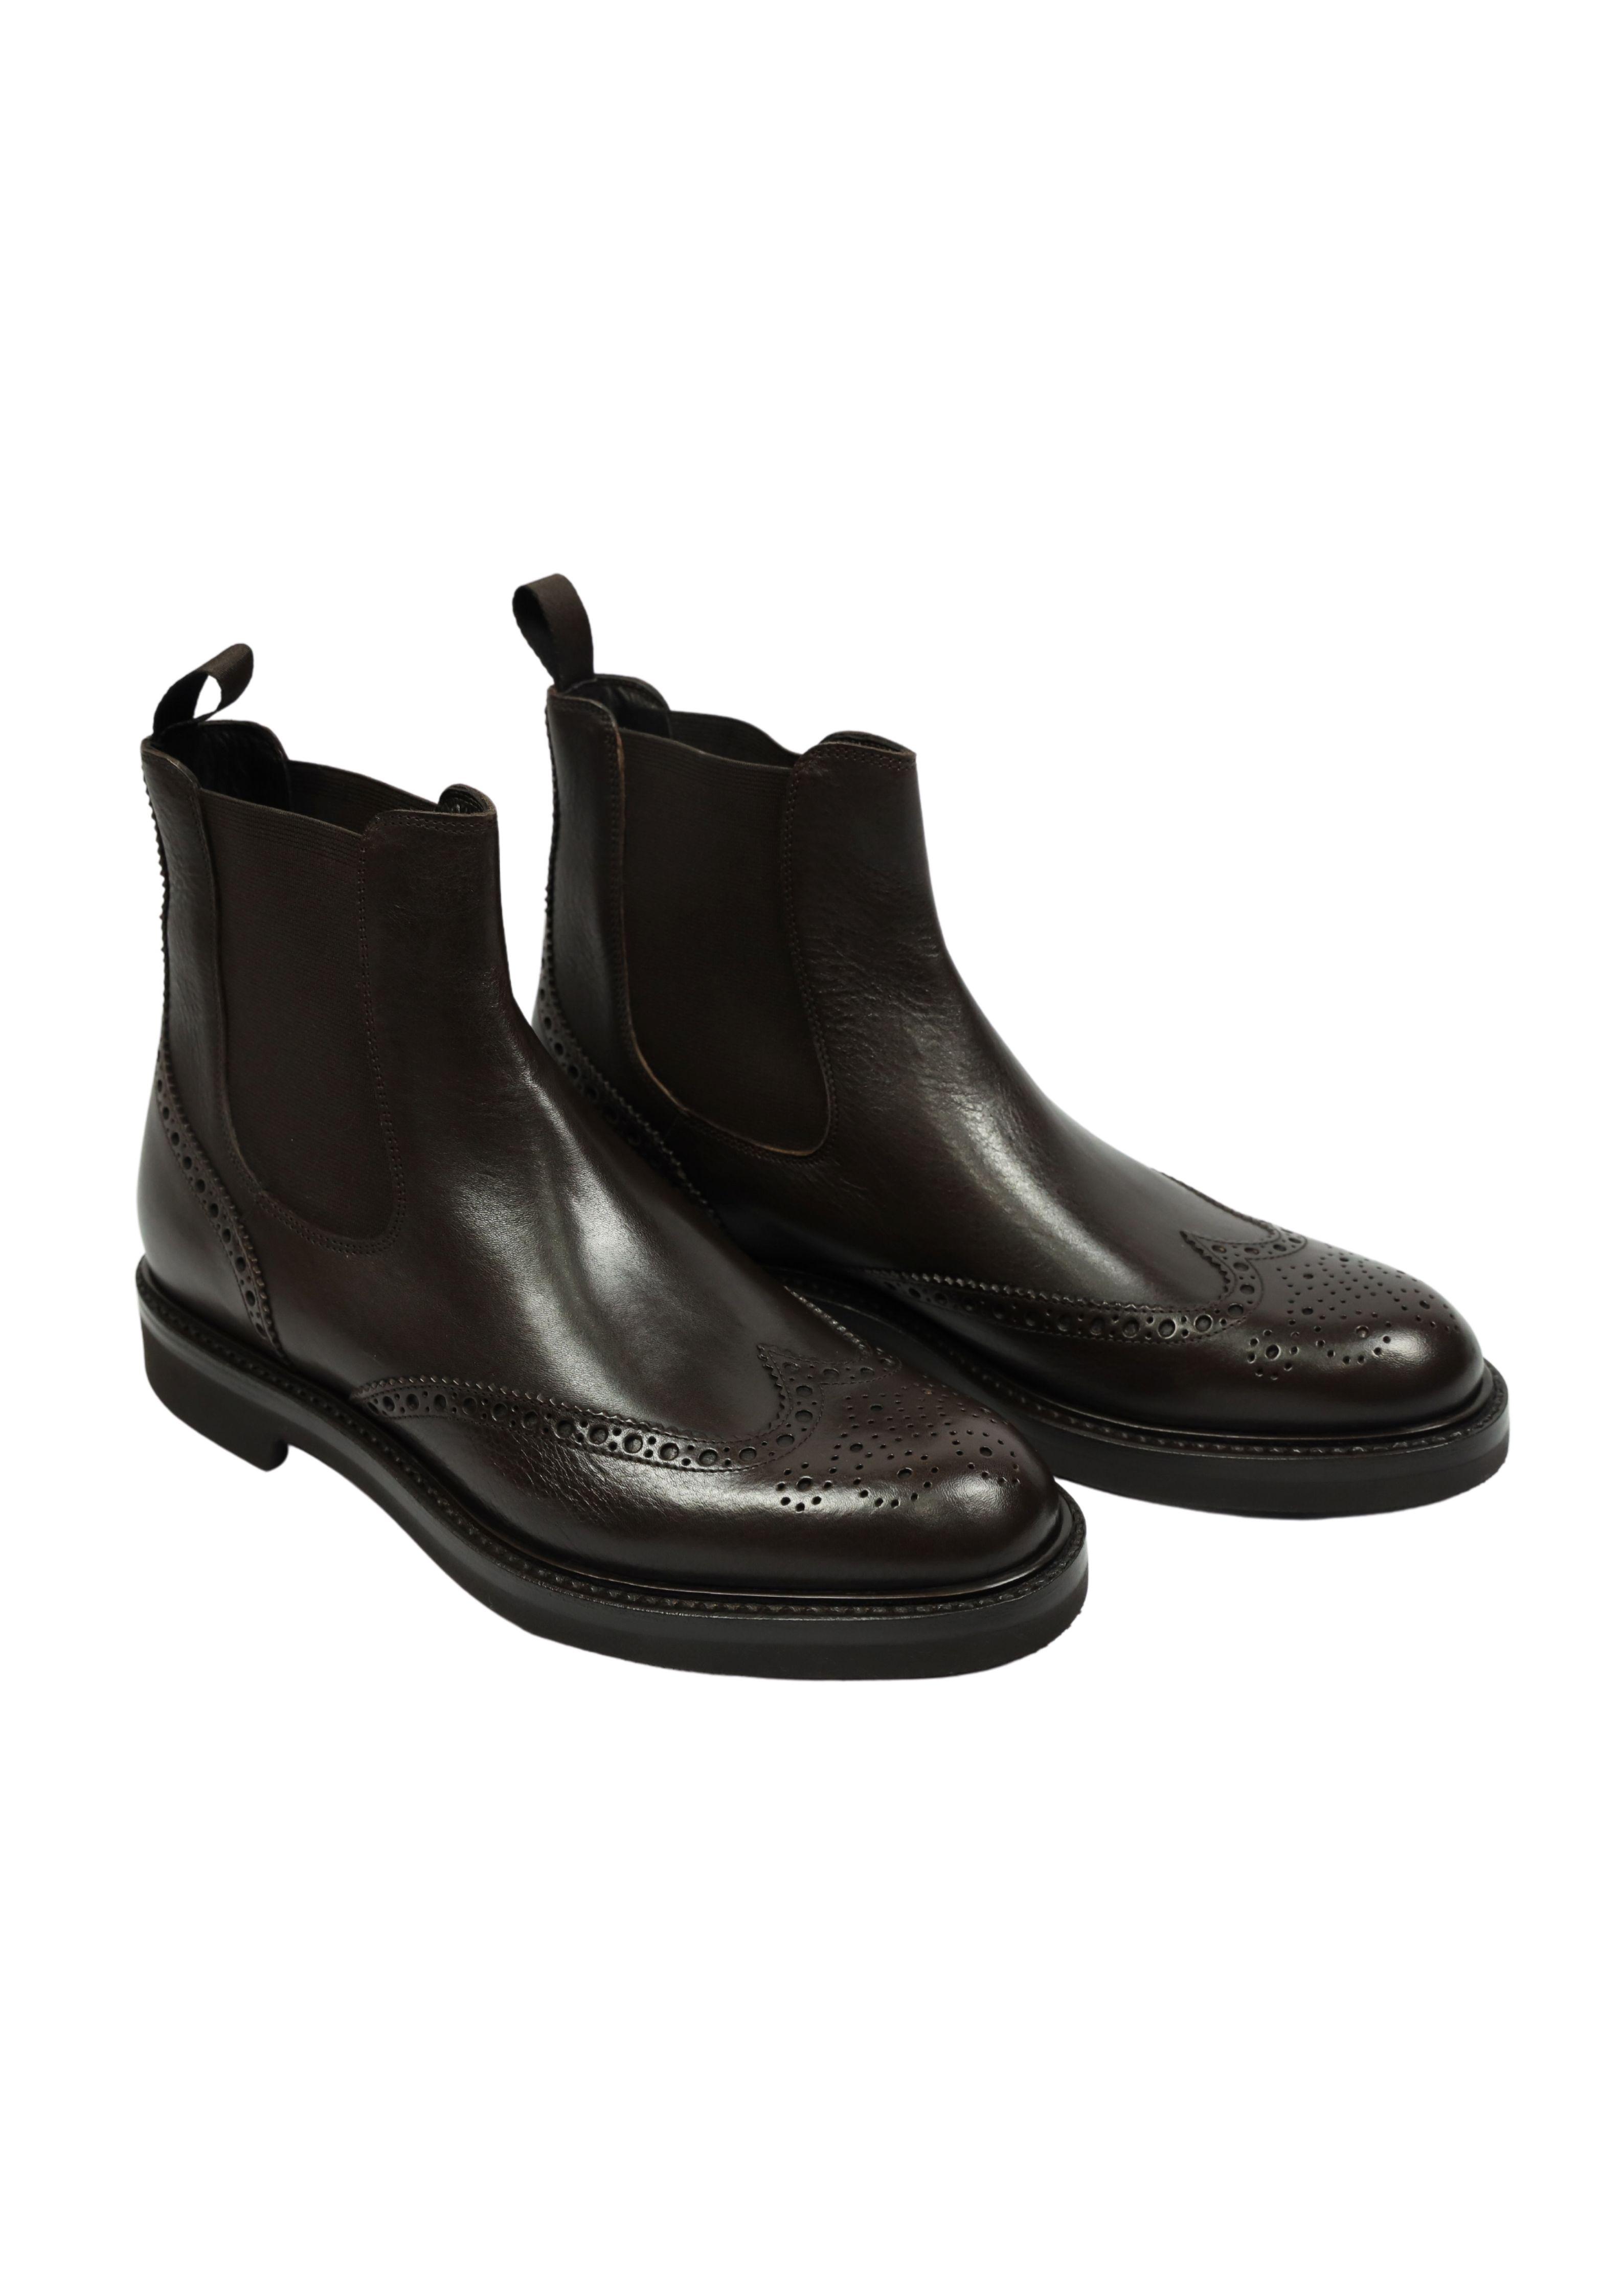 LEATHER BOOTS ORTIGNI | Shoes | 5823 595 BLACKMORO